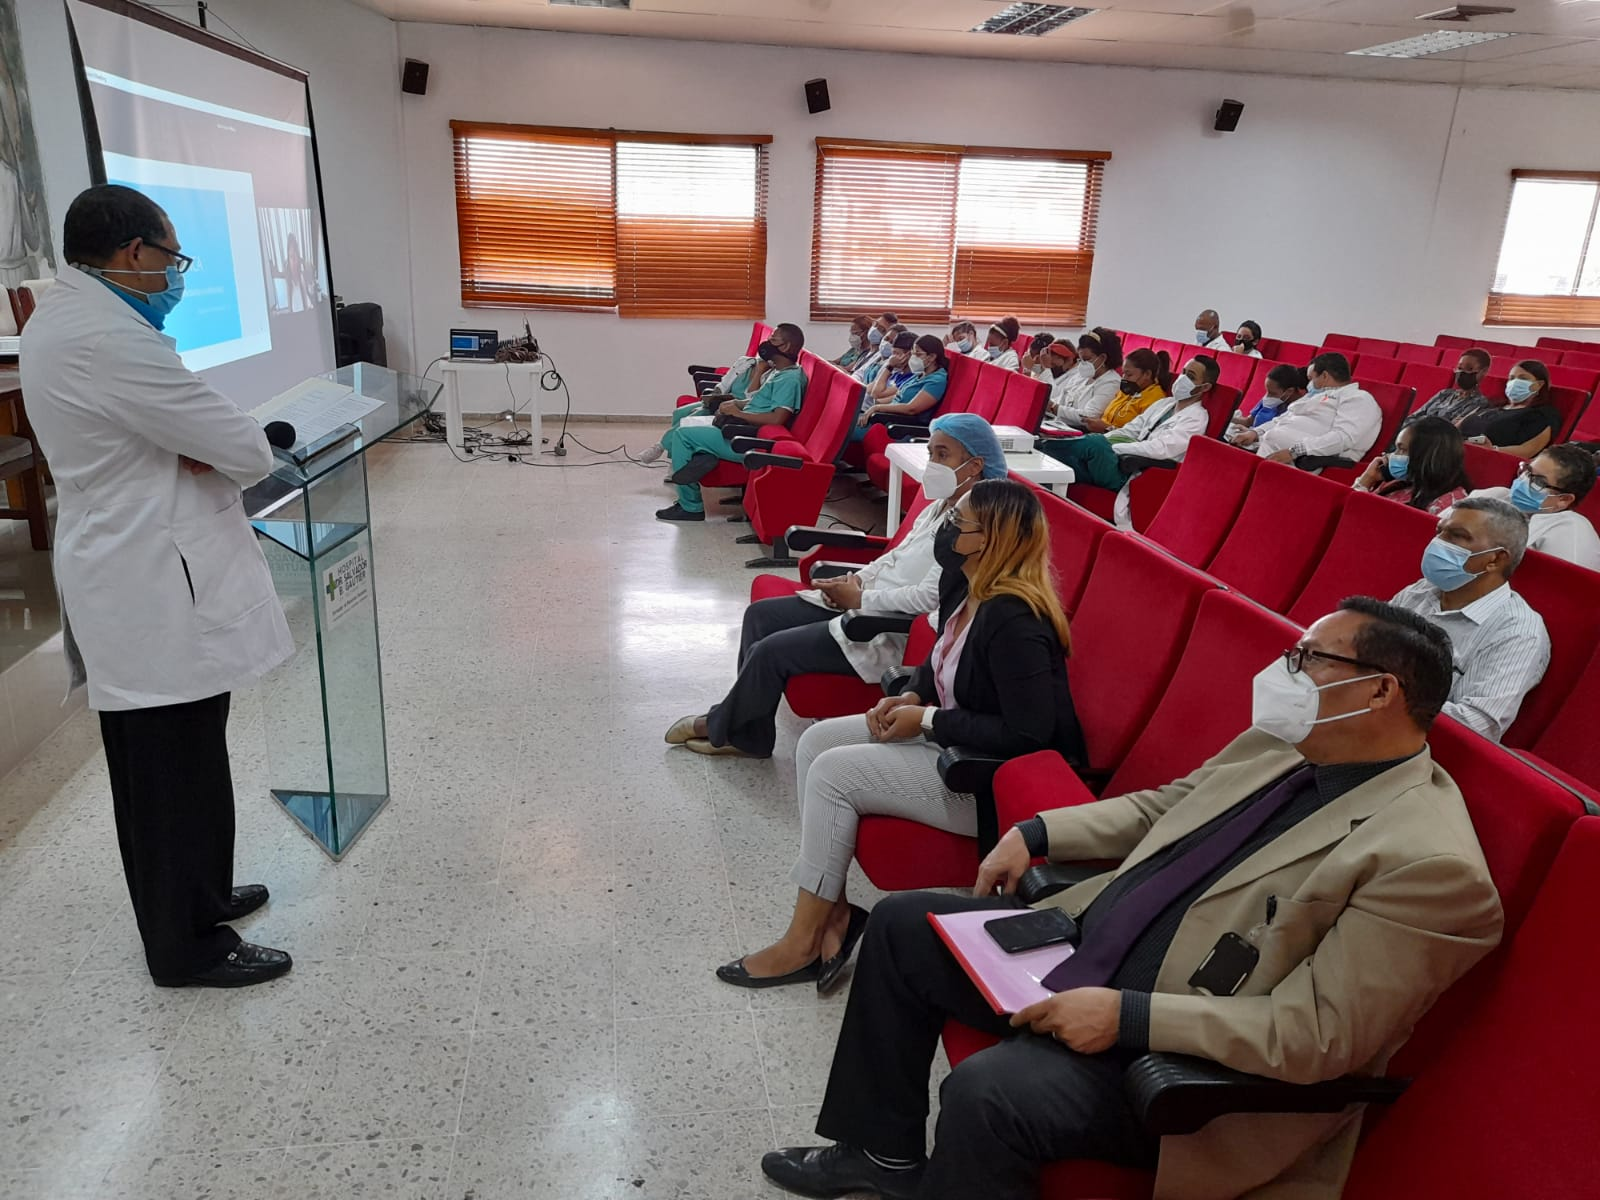 Hospital Gautier celebra 70 aniversario con jornada de actividades